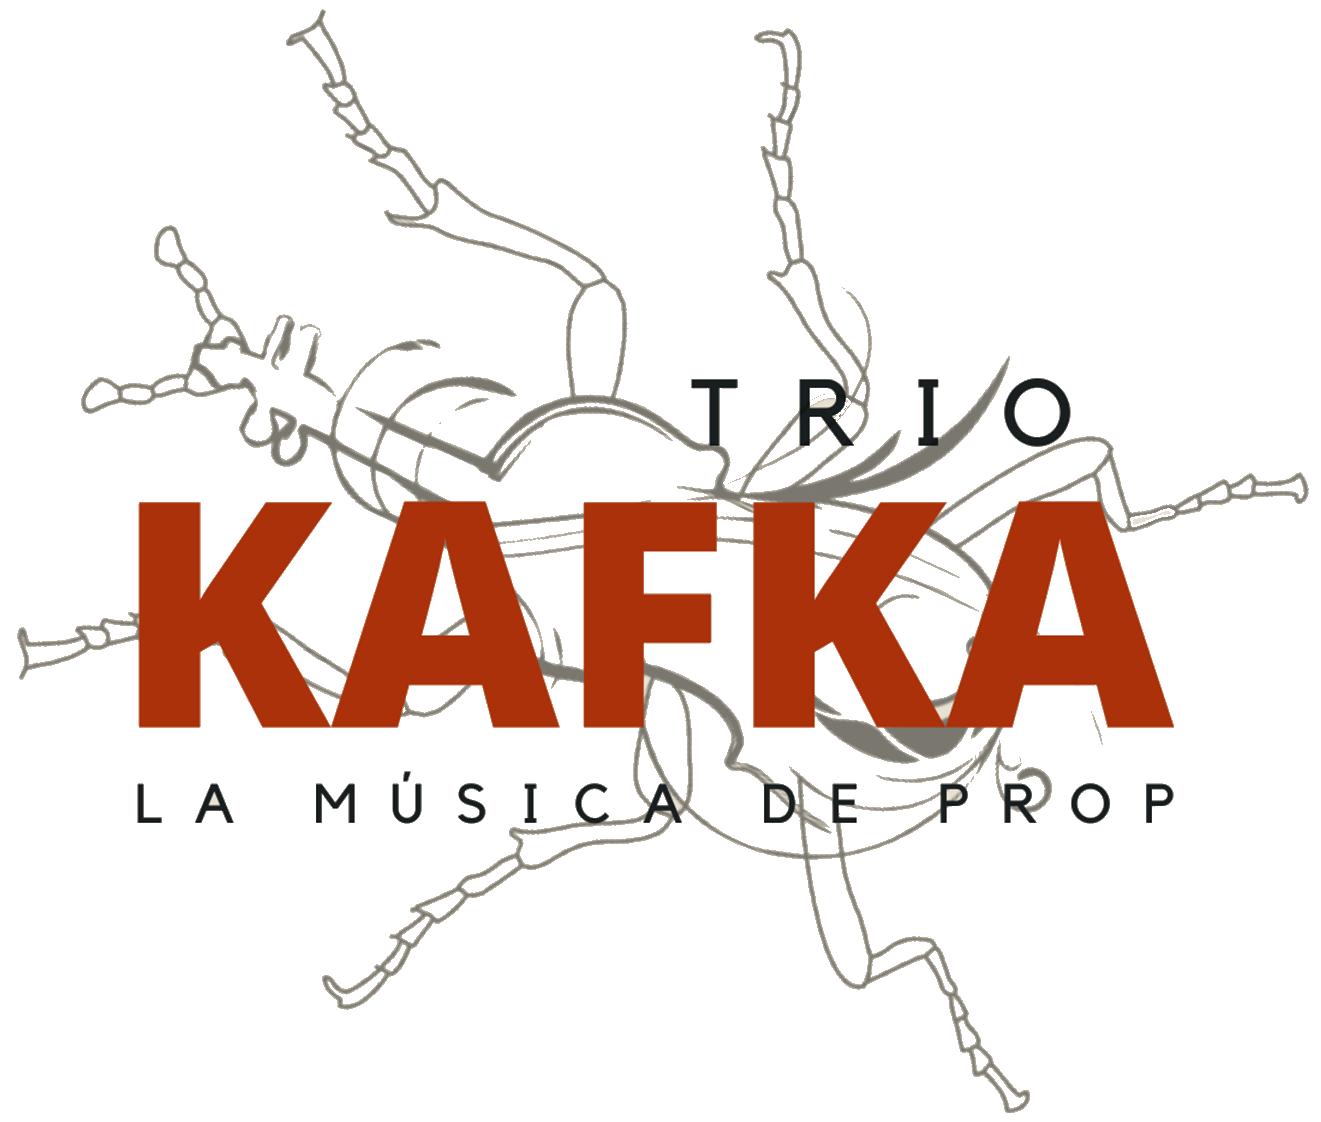 Kafka anagrama 2020 transp ret